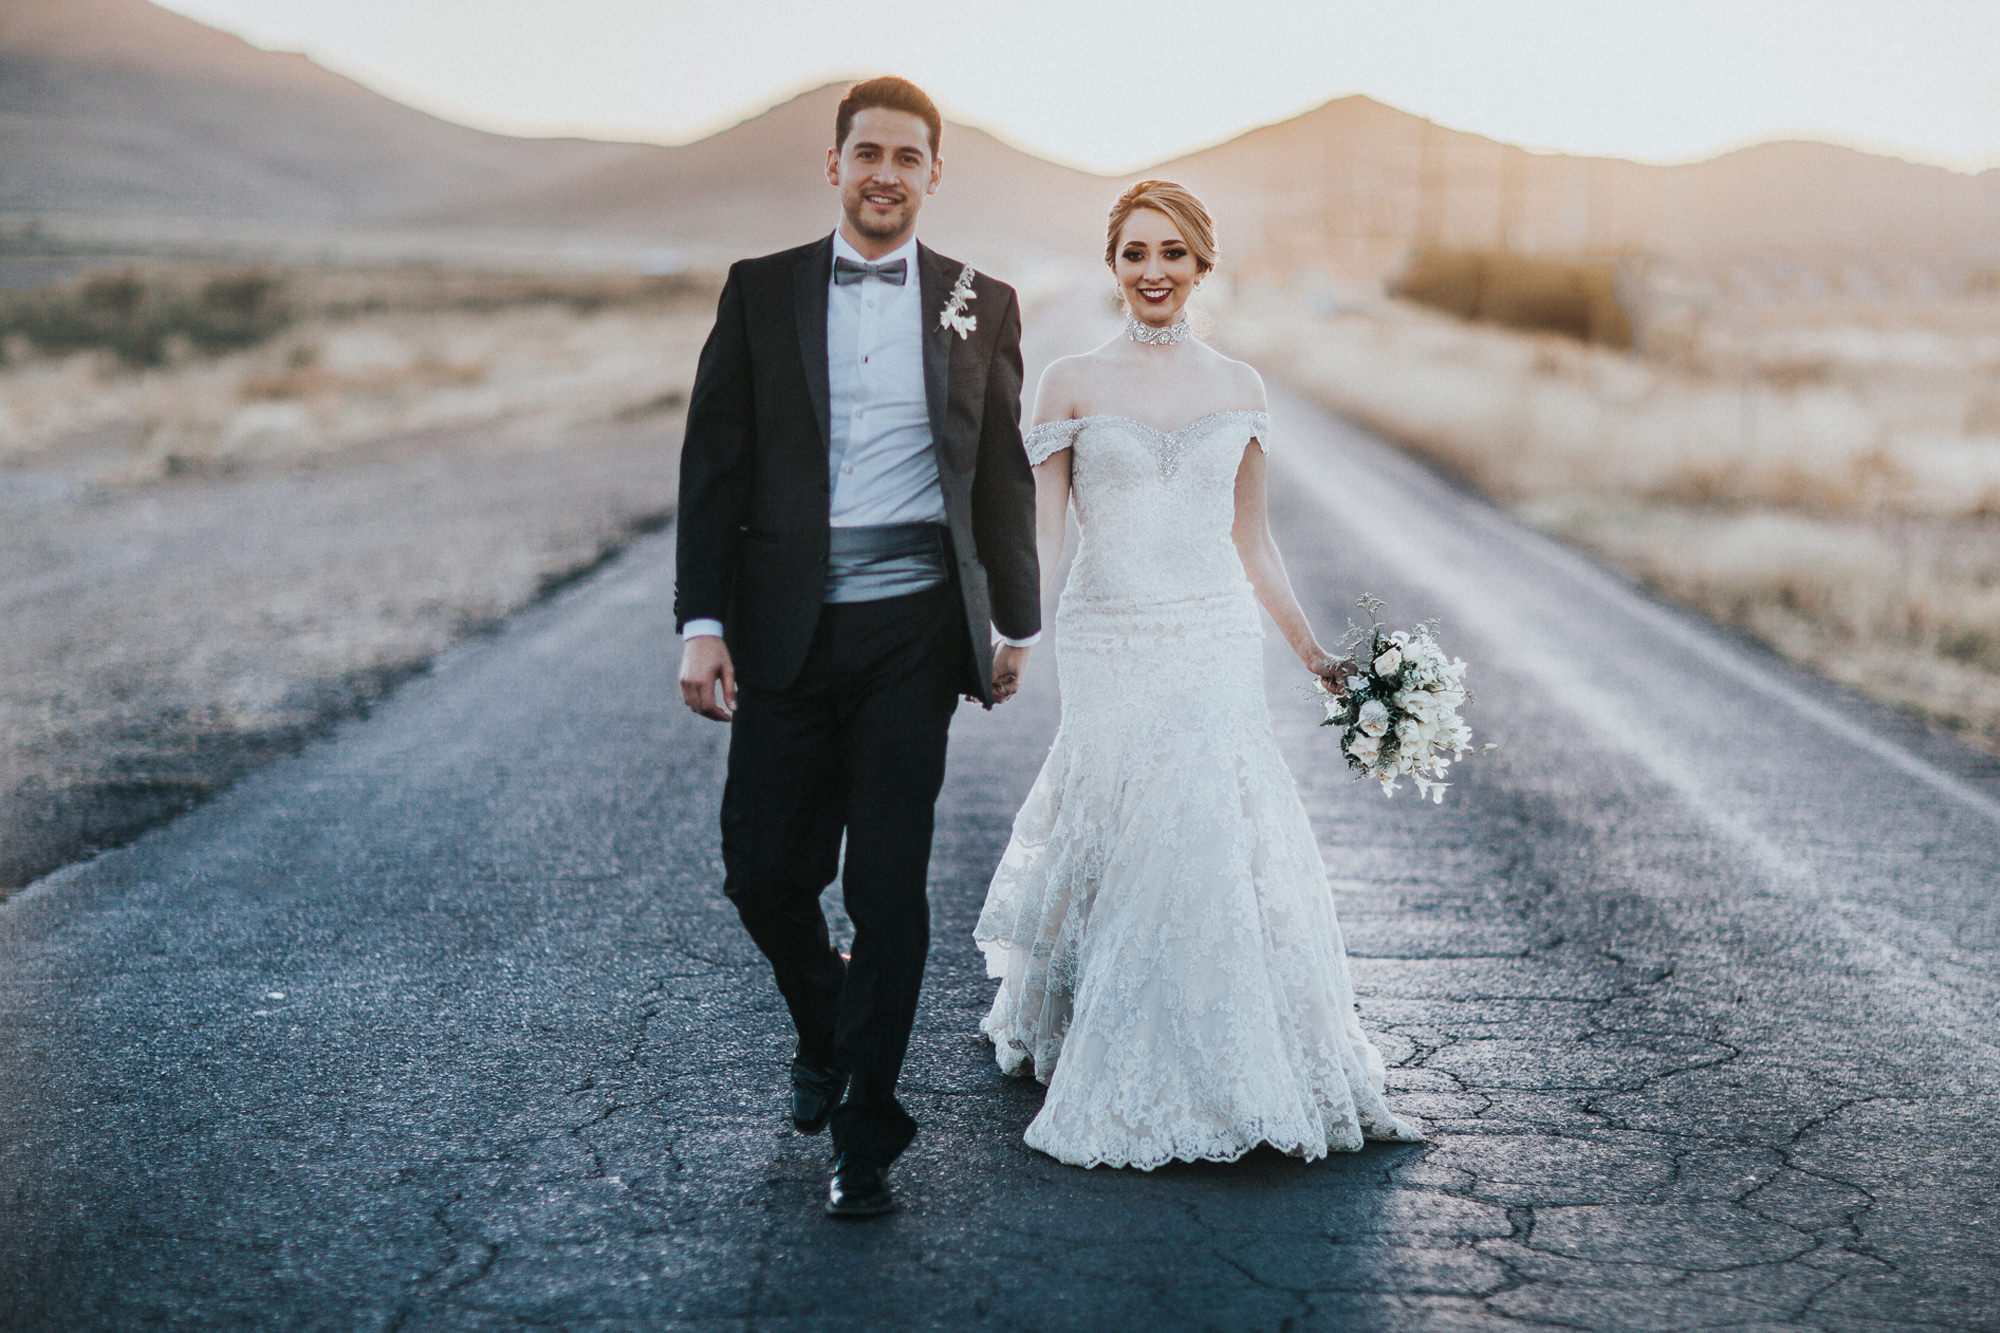 Mario-Karla-Wedding-137